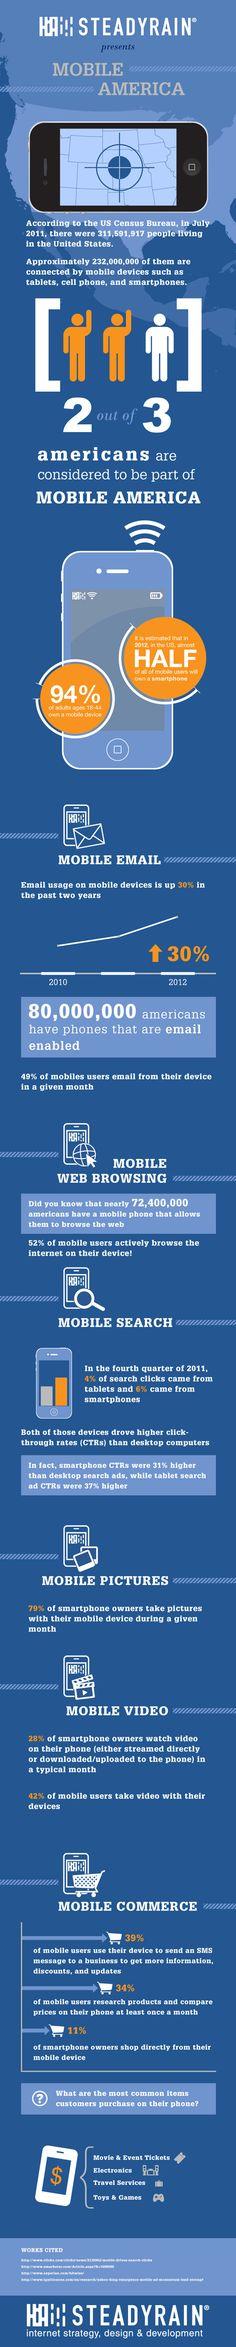 Mobile America #Mobile #Infographic